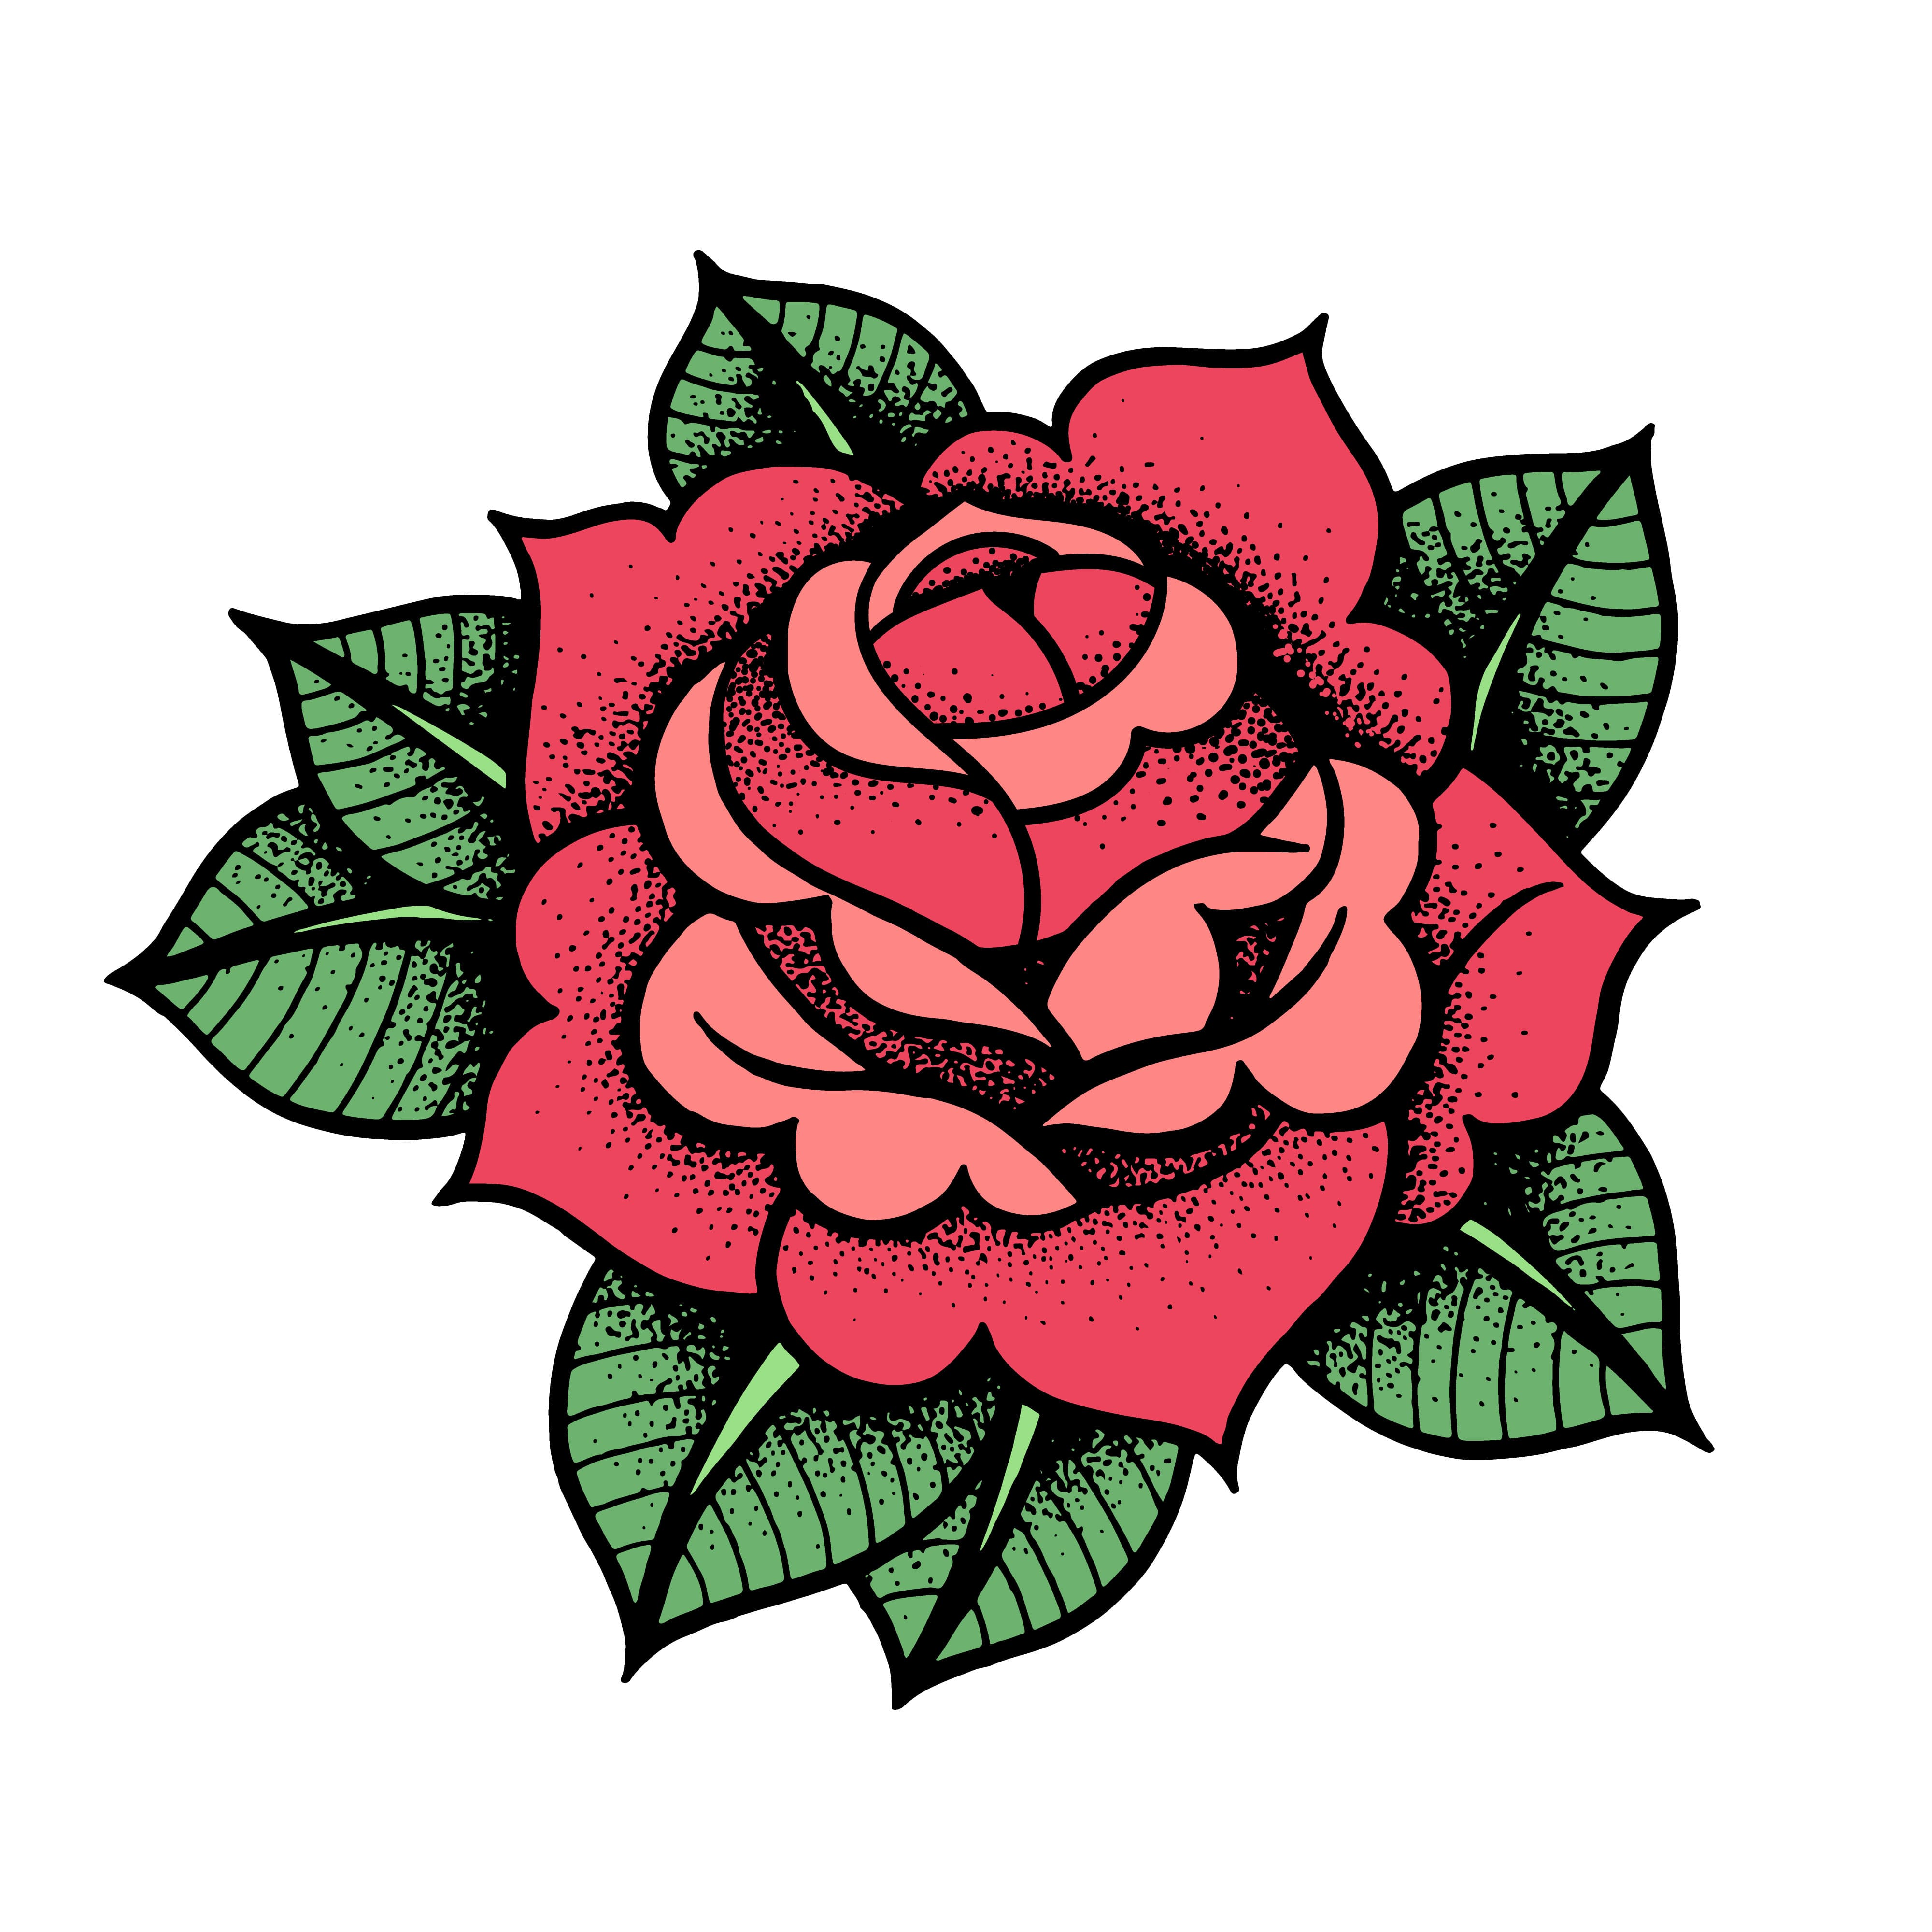 Tattoo Design Ideas for Girls - 9